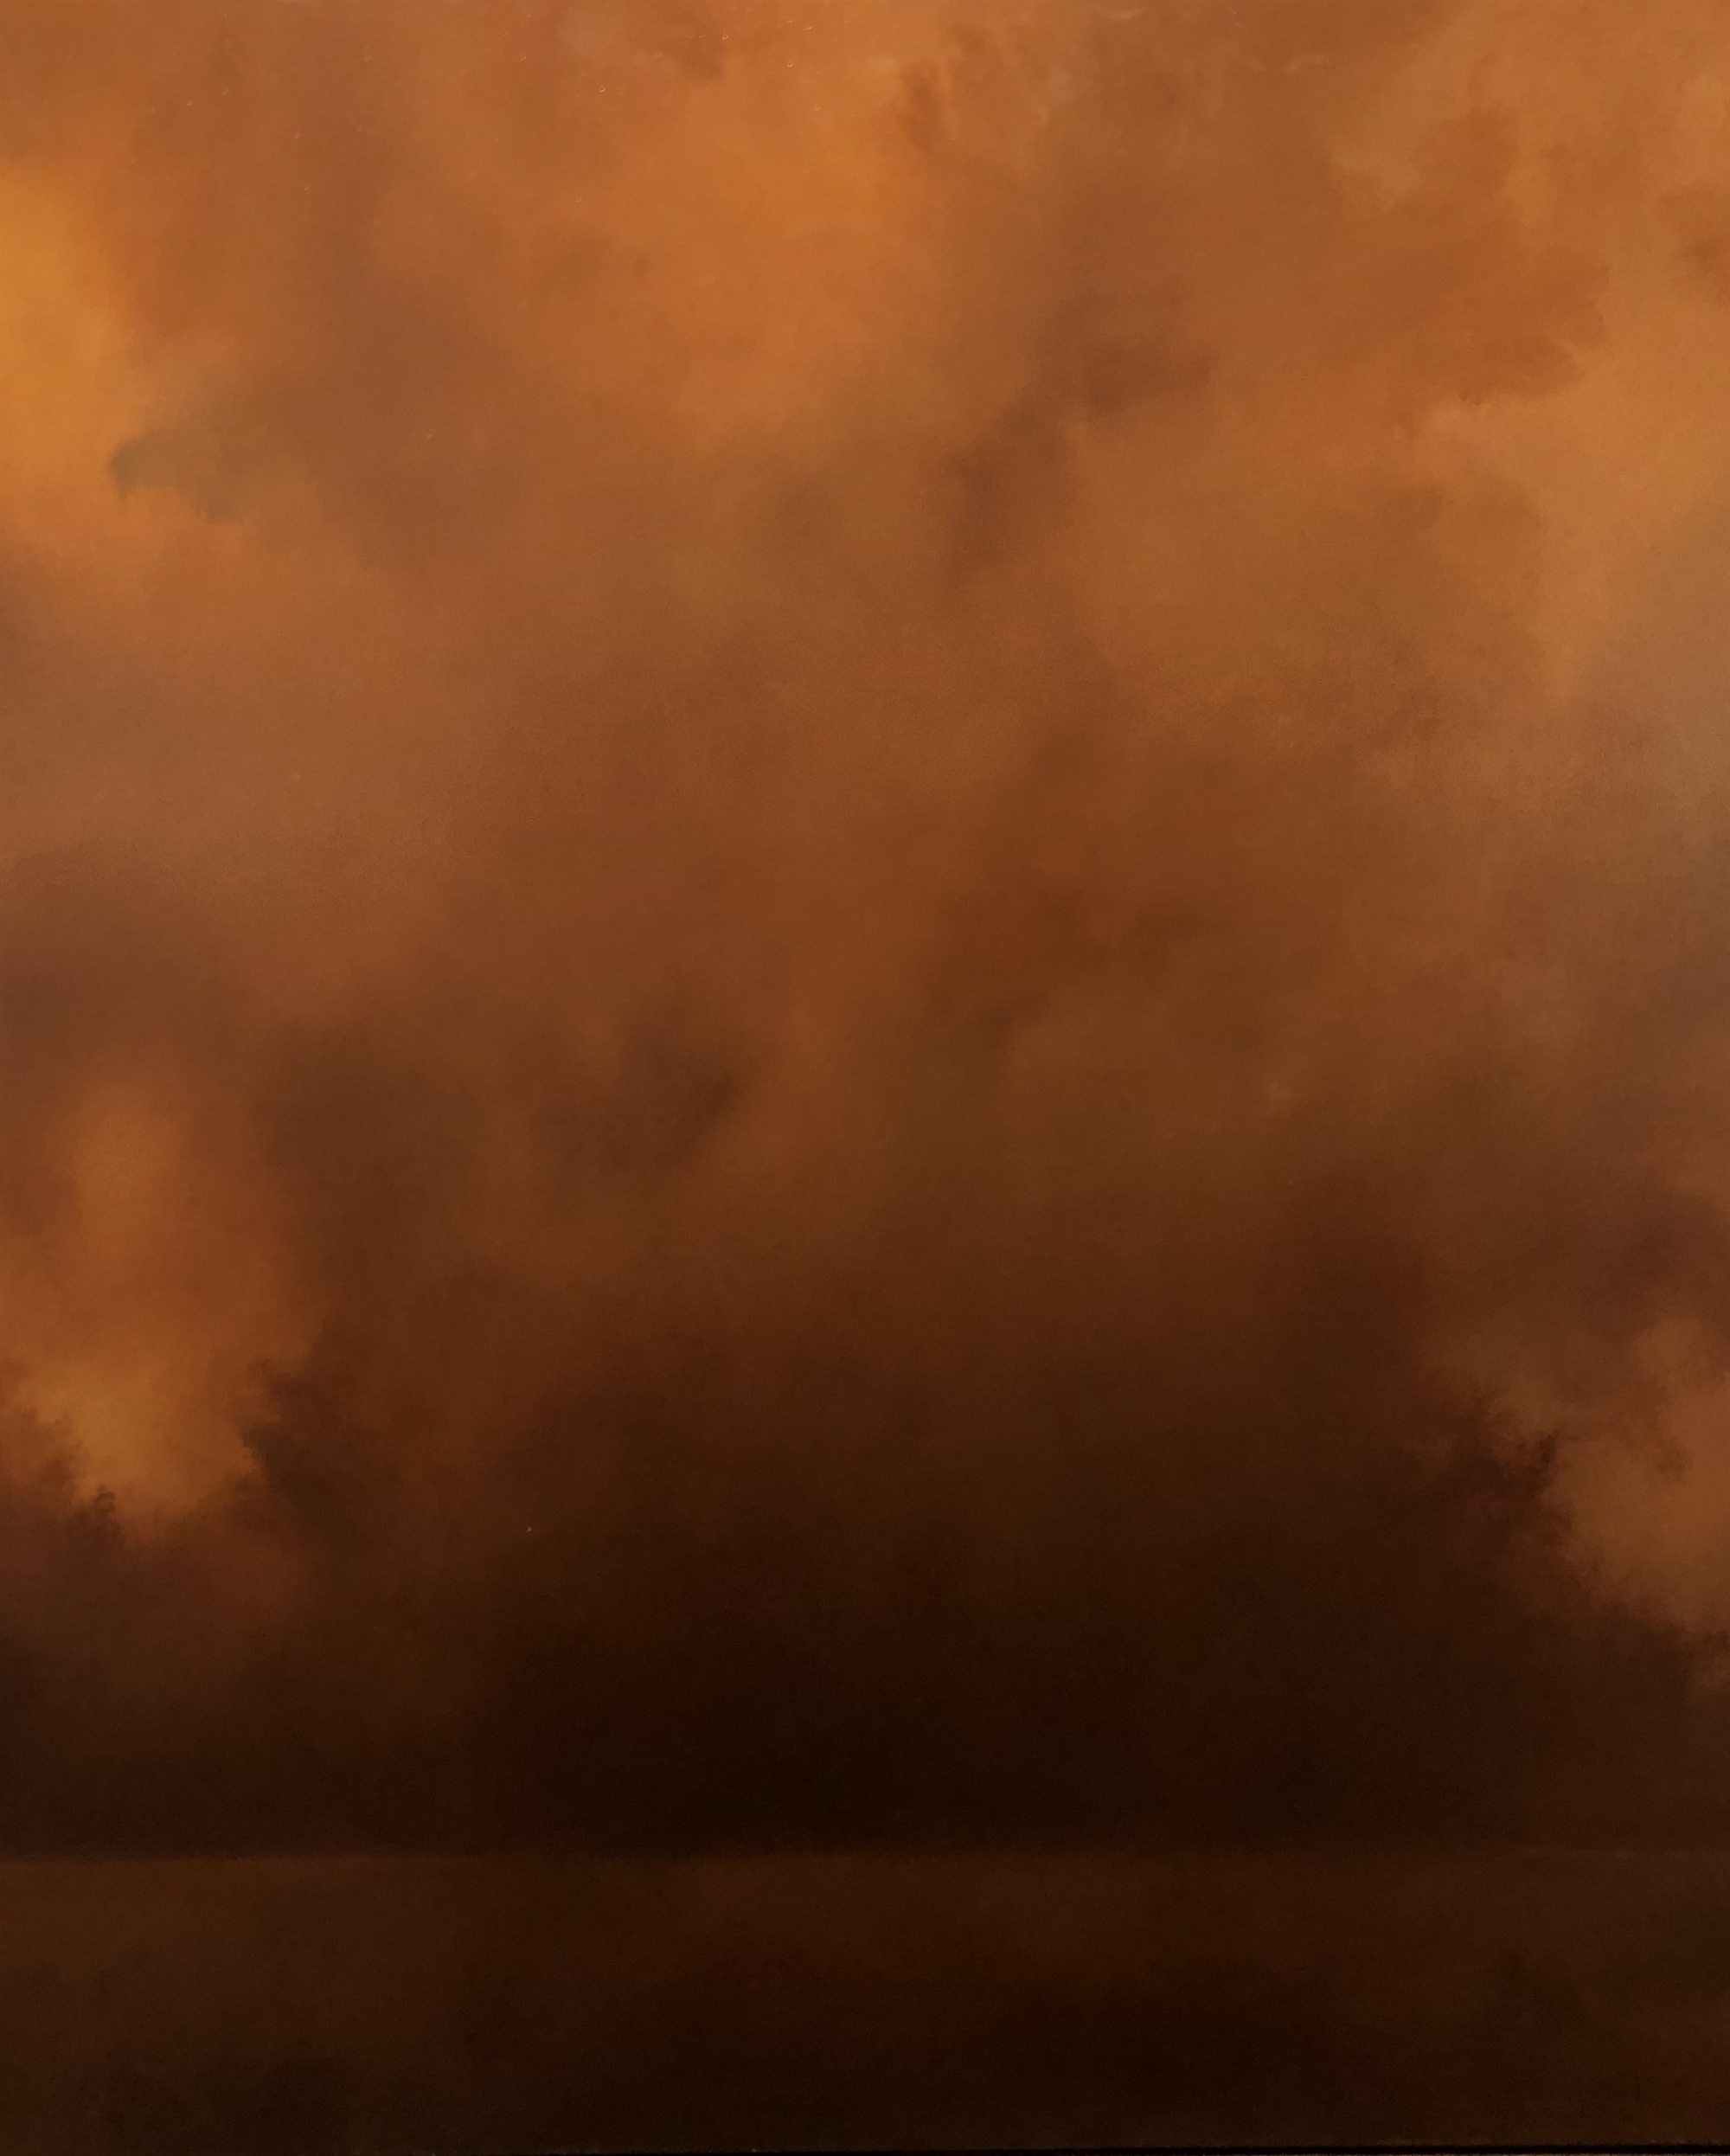 Landscape XIX by William Wahlgren